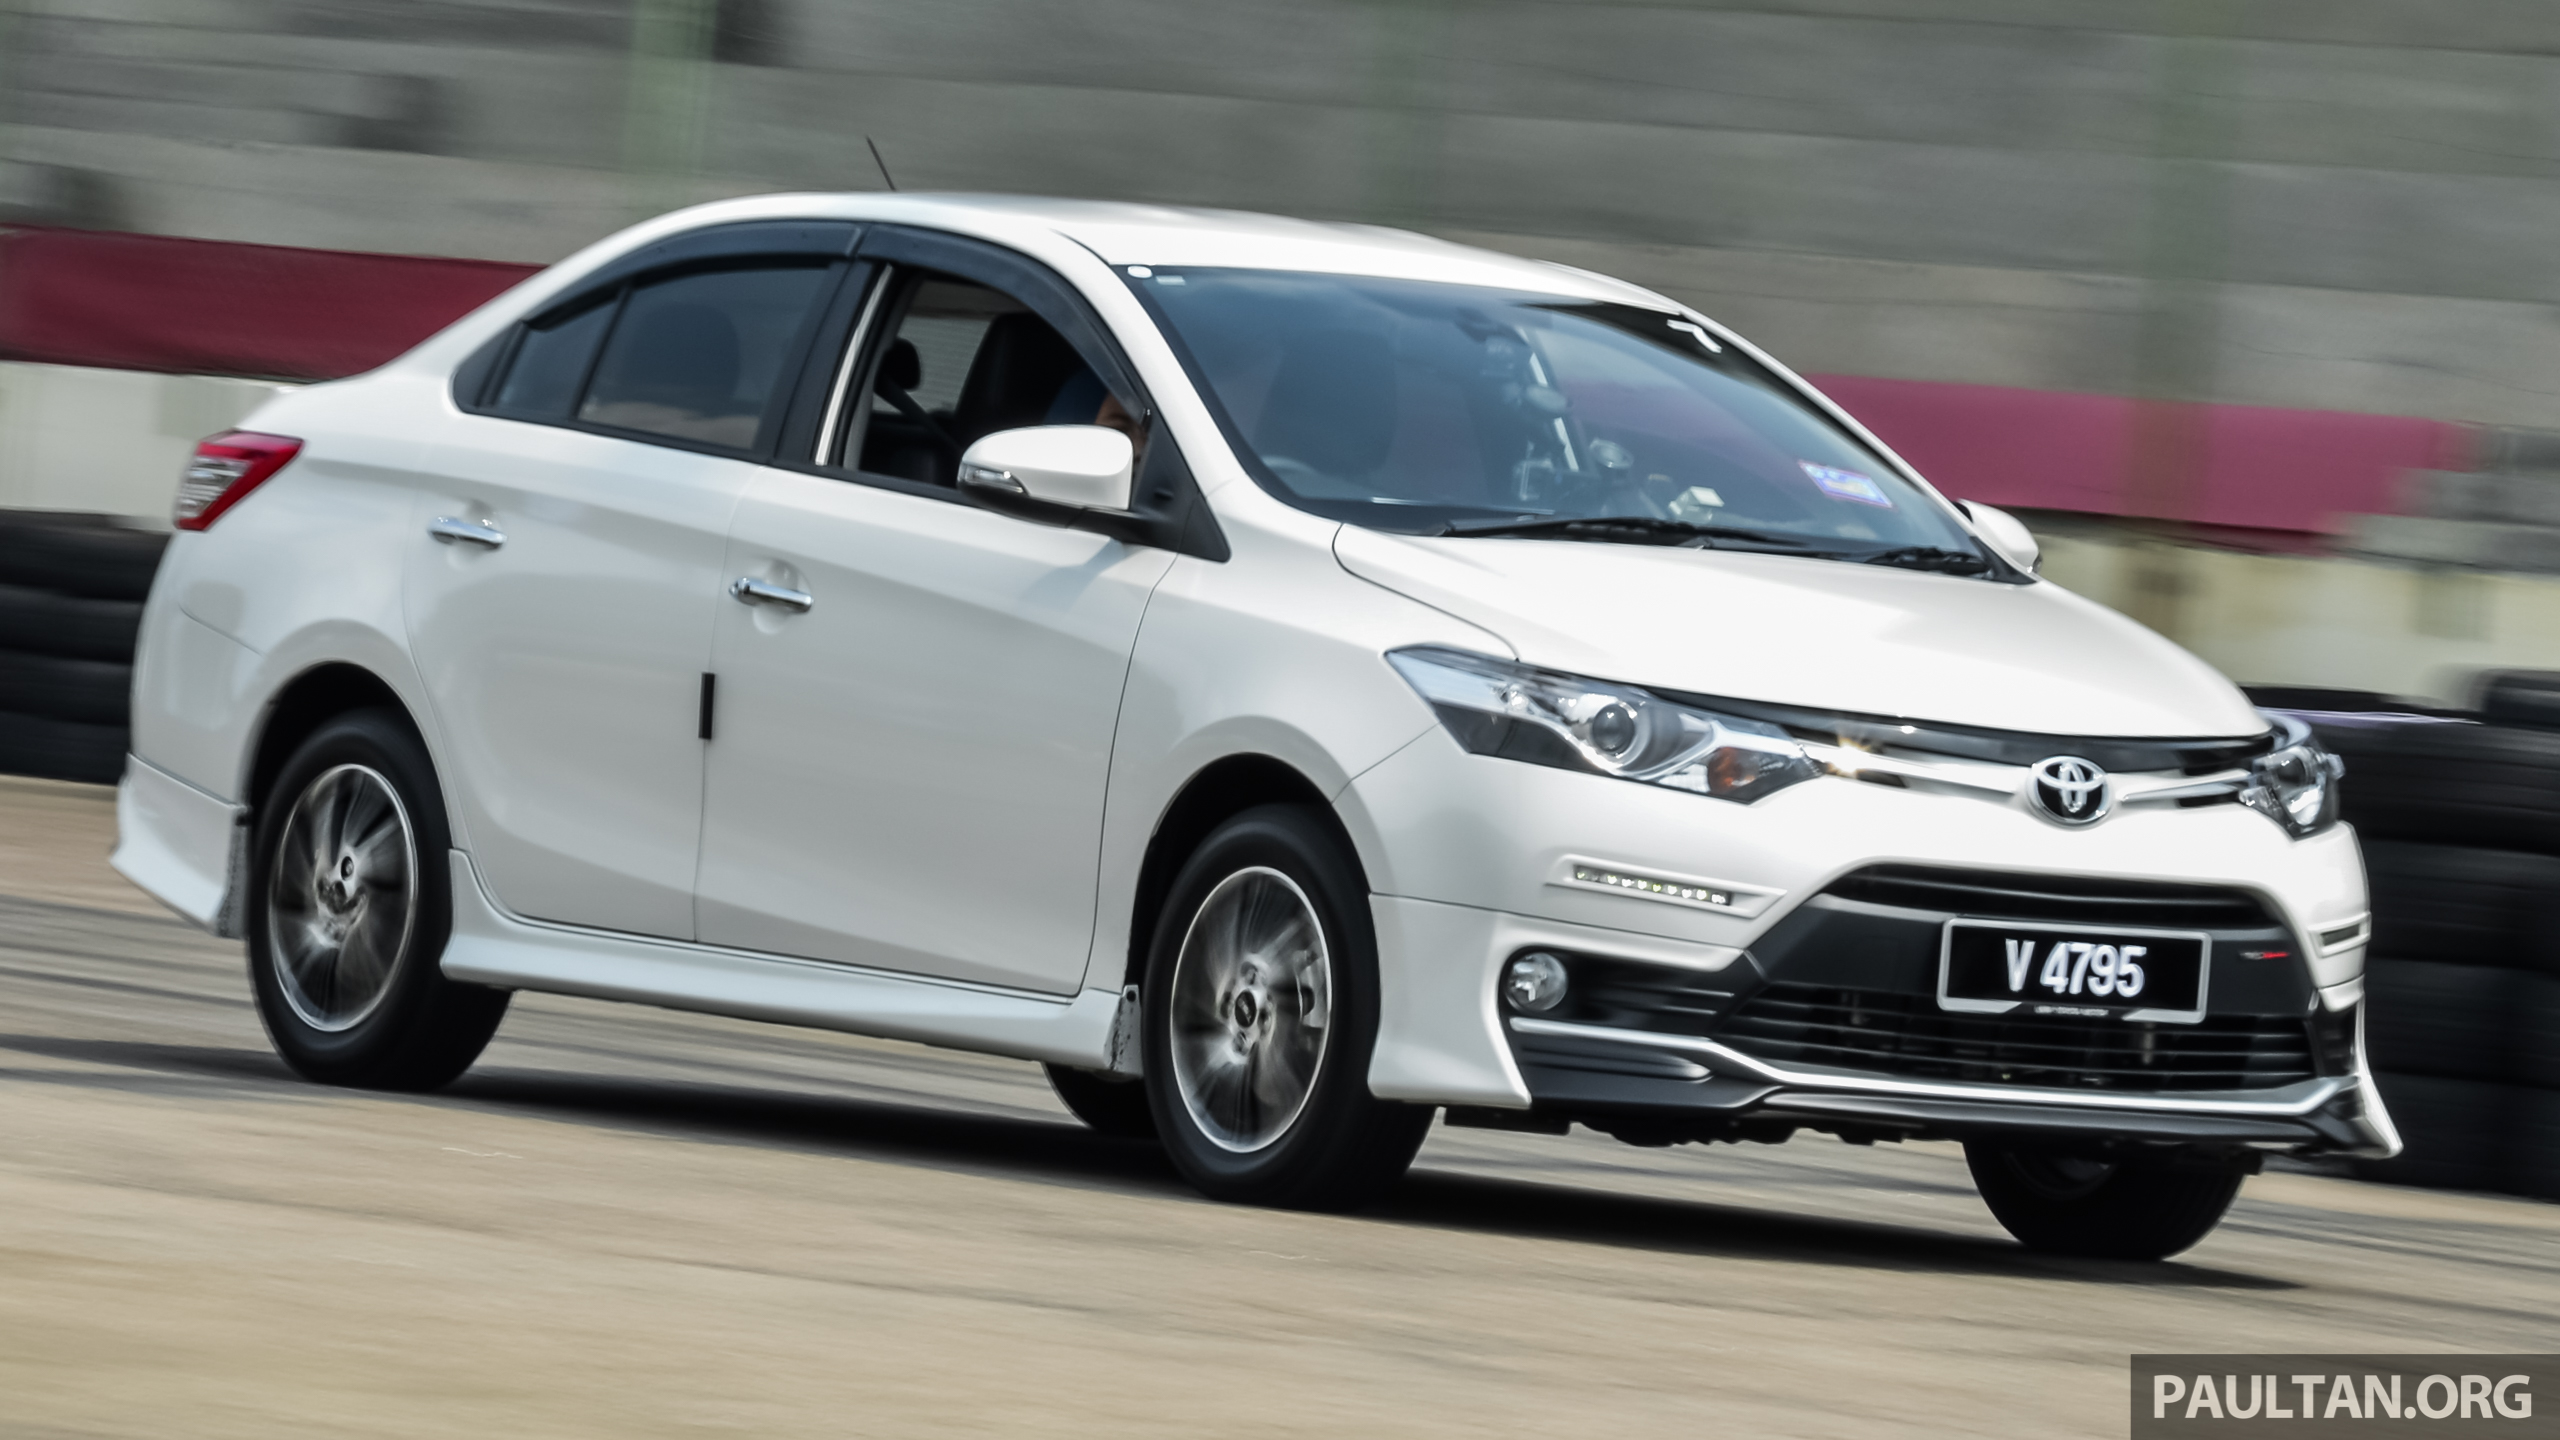 Toyota Chr Philippines >> Toyota Vios Paultan | Upcomingcarshq.com